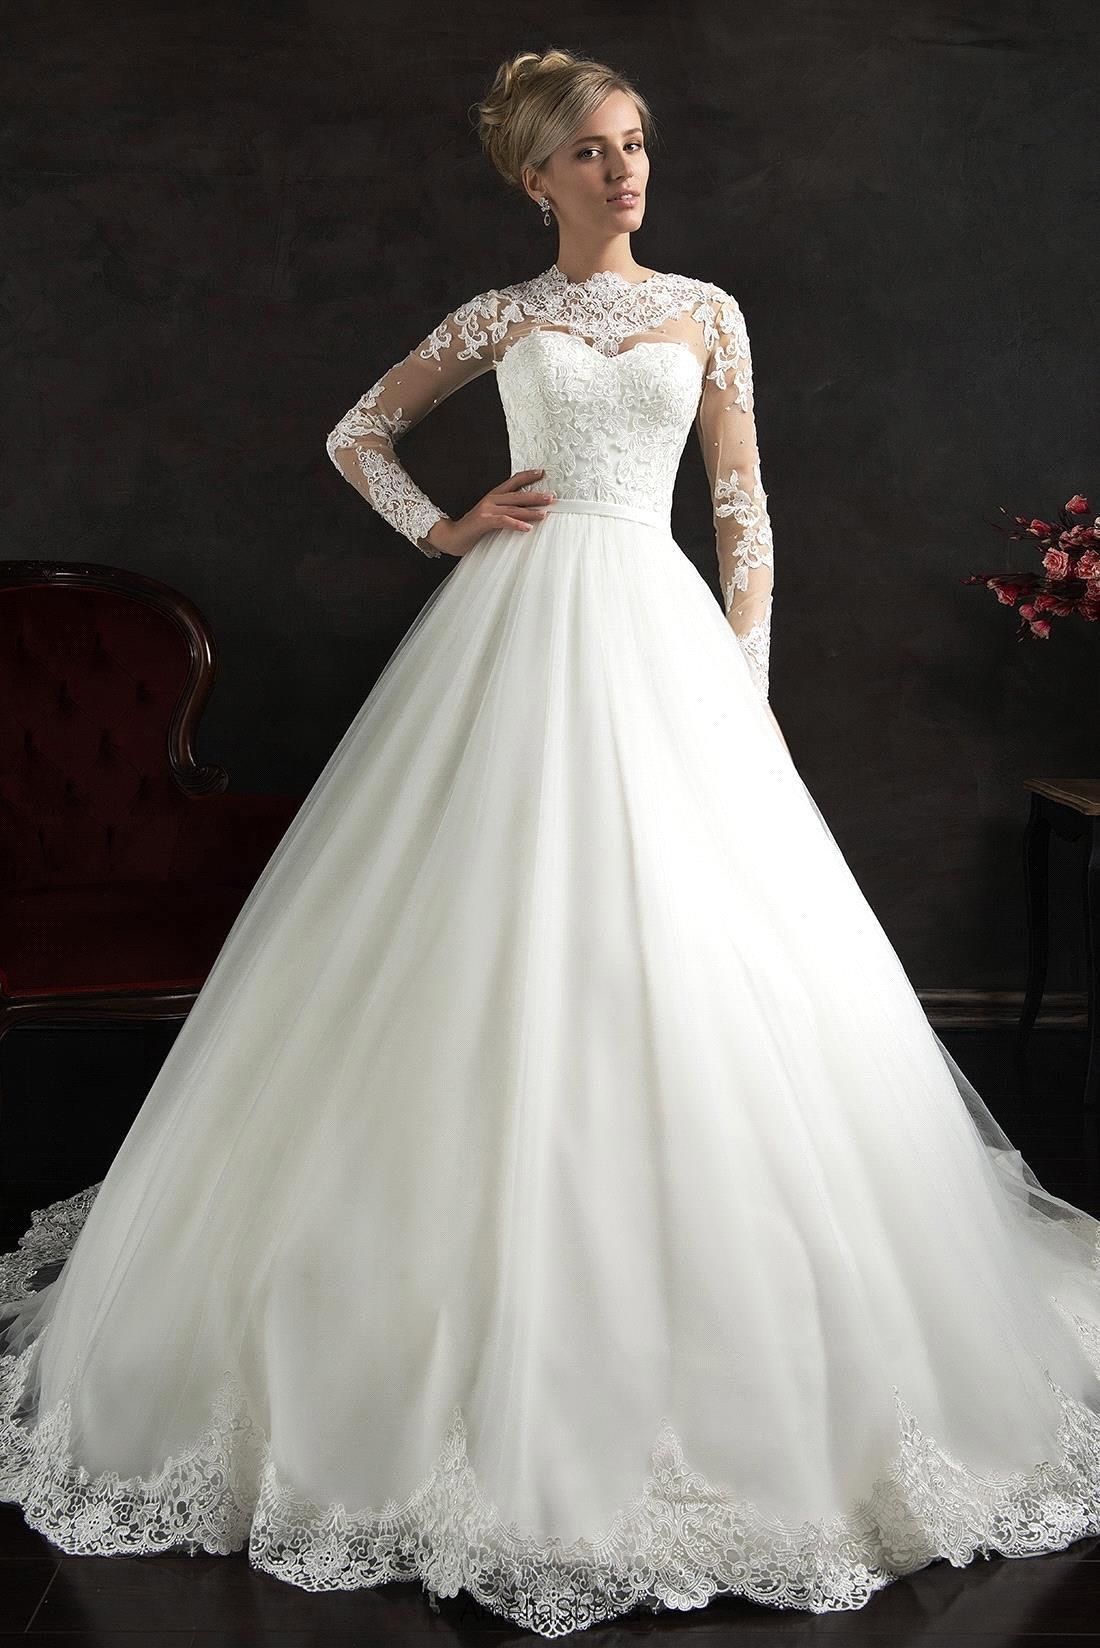 Cheap Princess Wedding Dresses princess wedding dress Deep V Neck Long Sleeves Lace Tulle A Line Wedding Dress